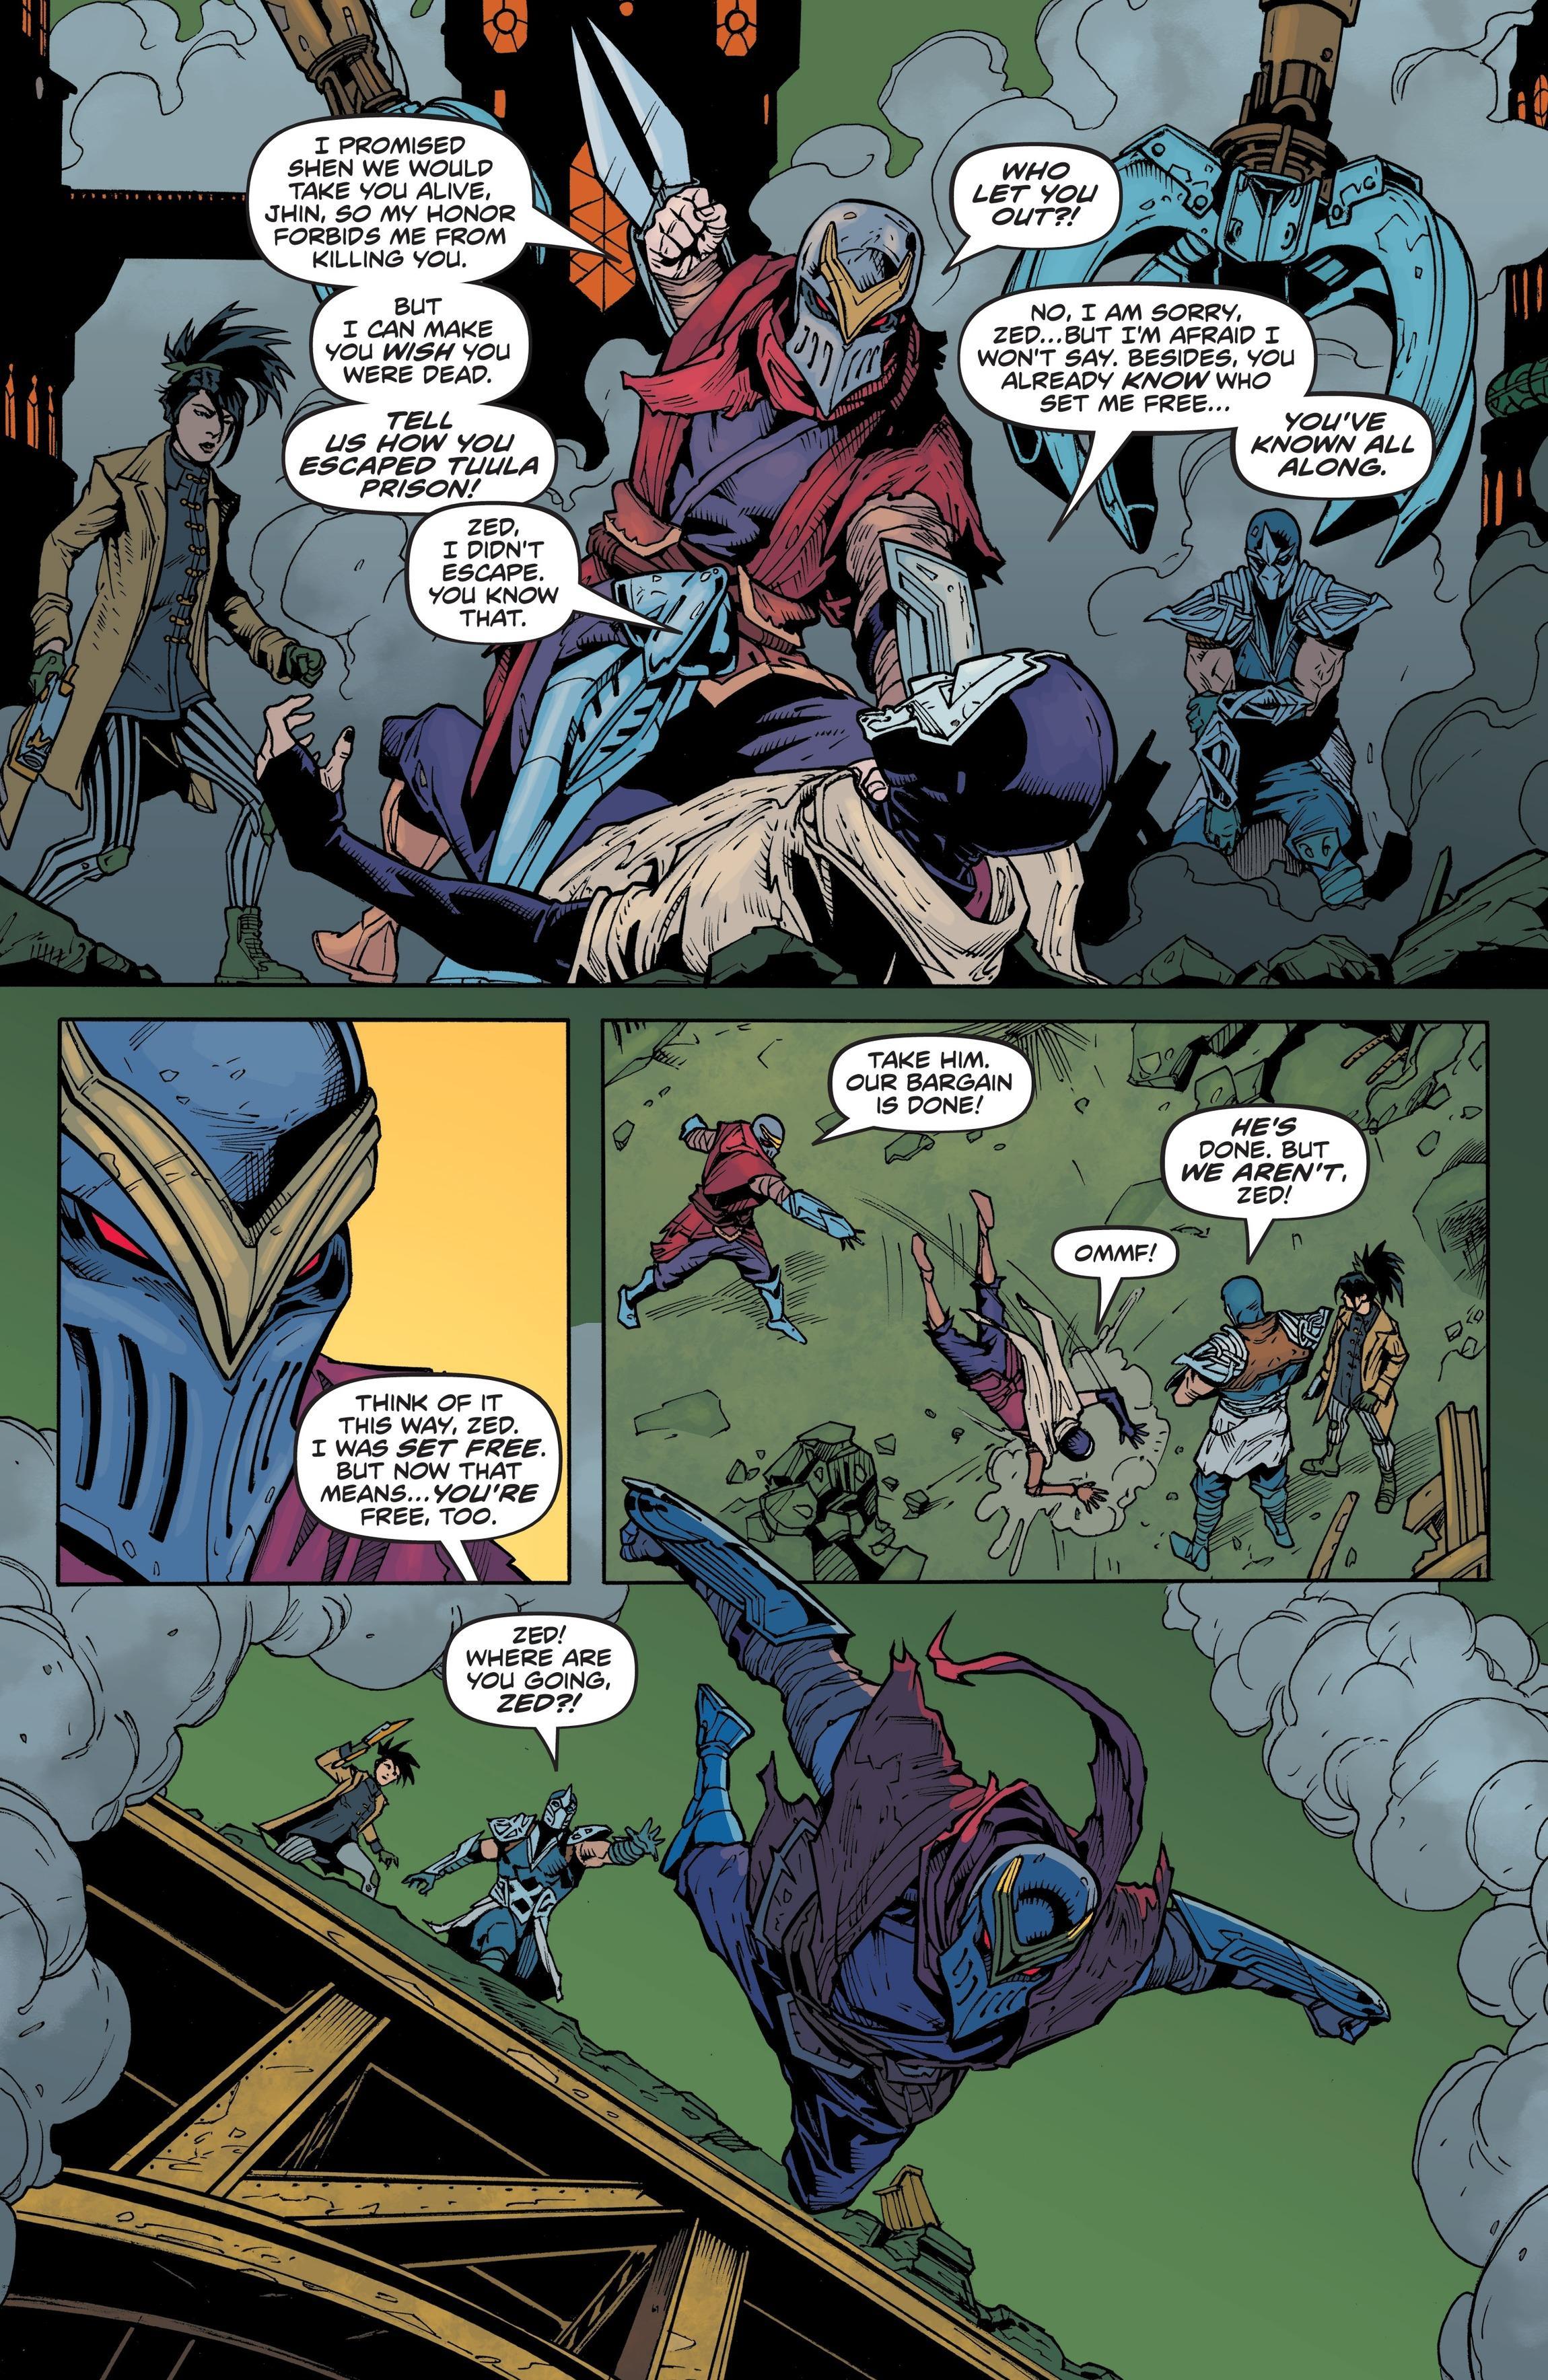 Zed Comic 6 pr11